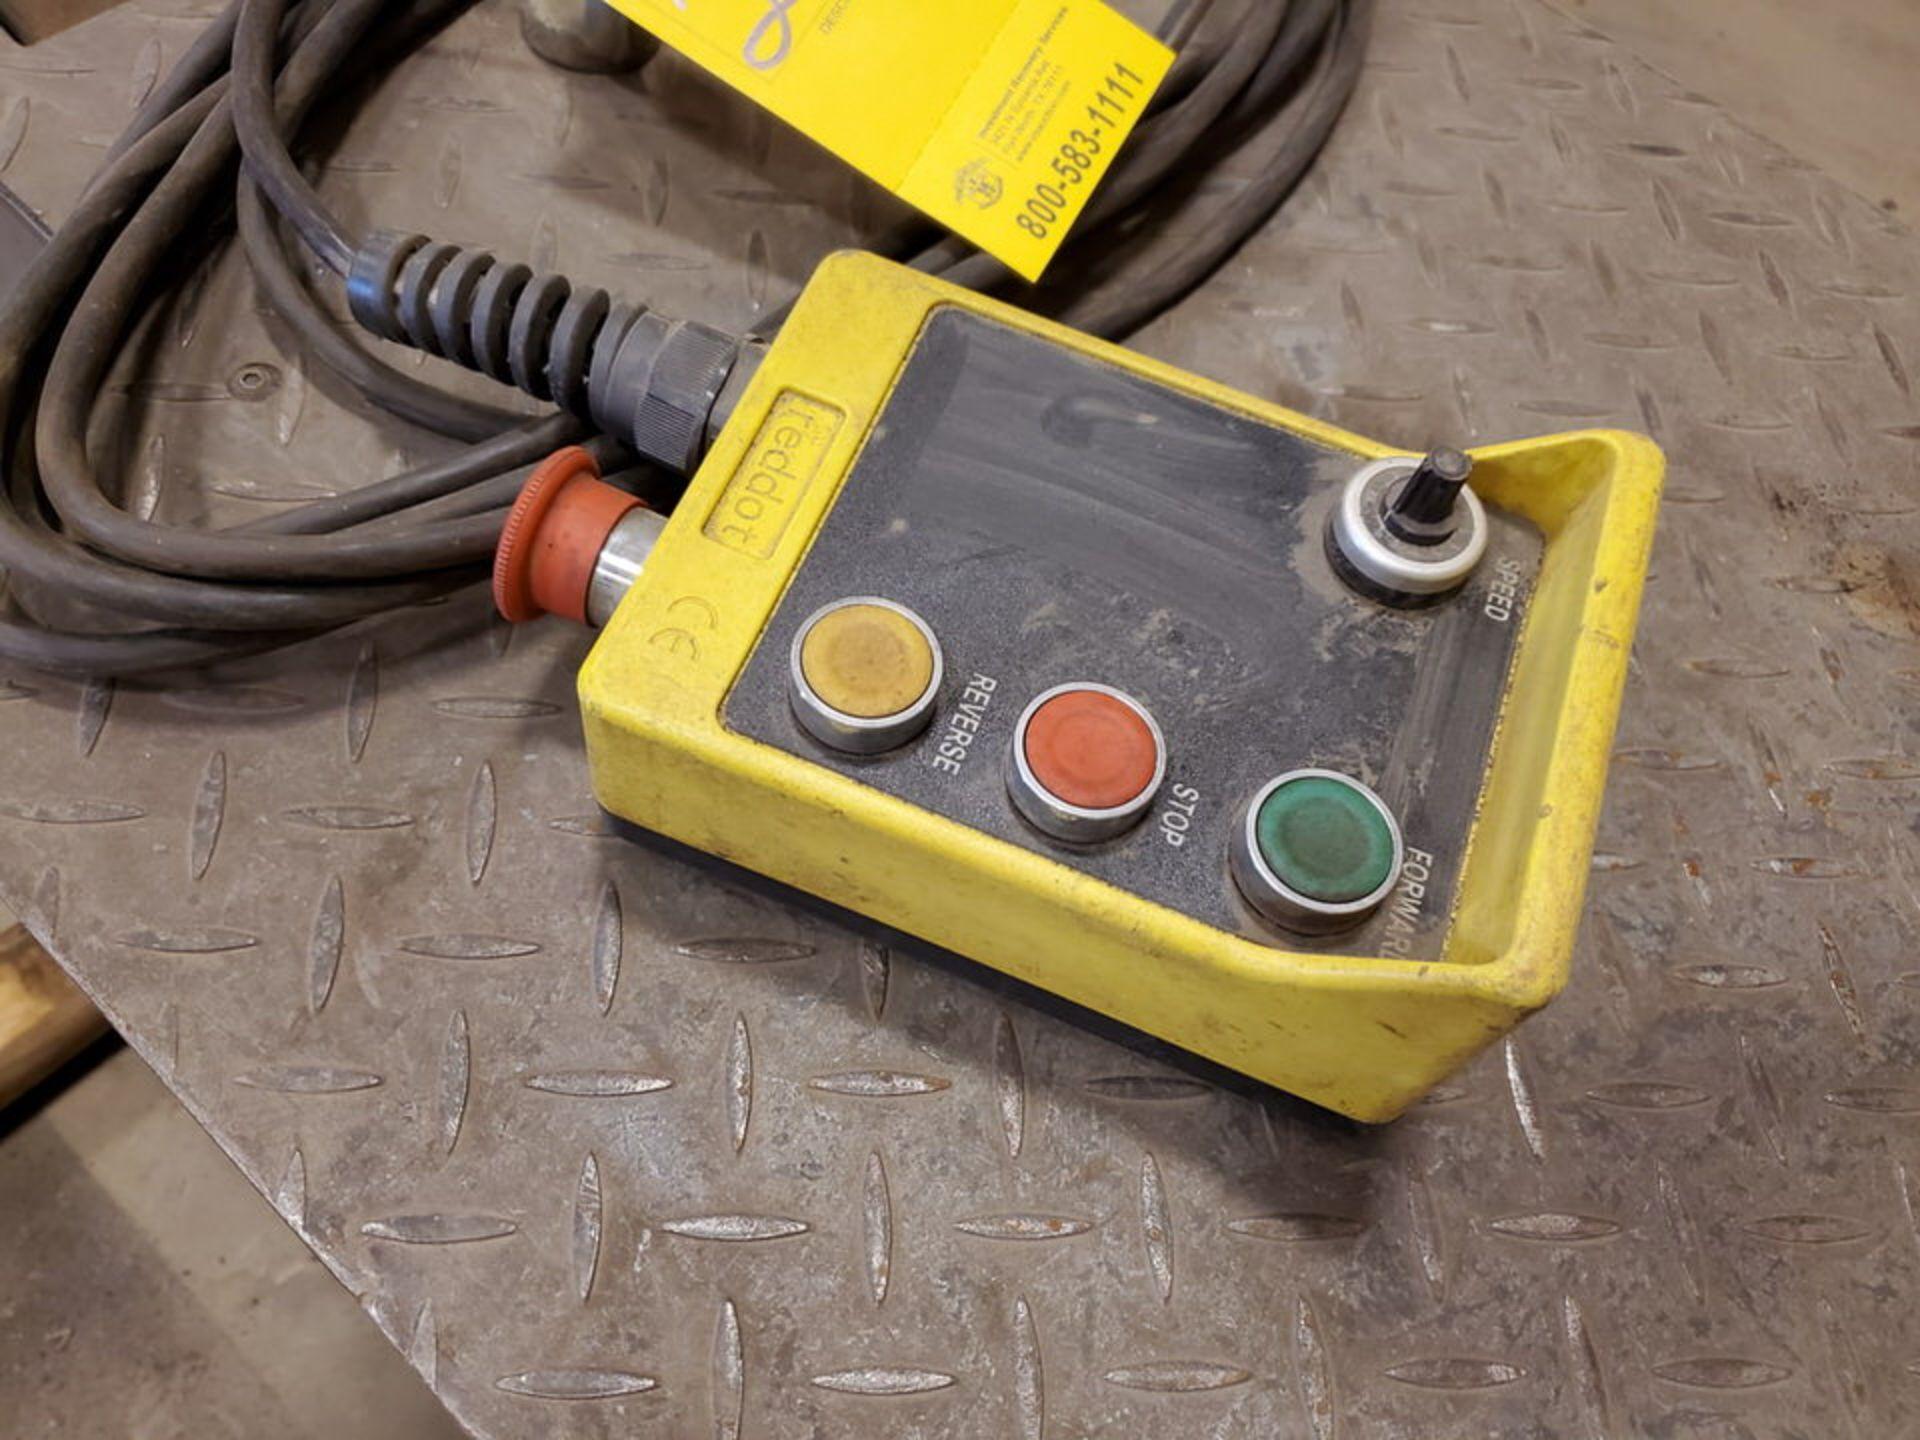 "Profax TR-40000 Turn Roll 40K Cap., 440V, 15A, 50/60HZ, 3PH, RPM: 0-1.7, 6"" Wheel Dia - Image 8 of 8"